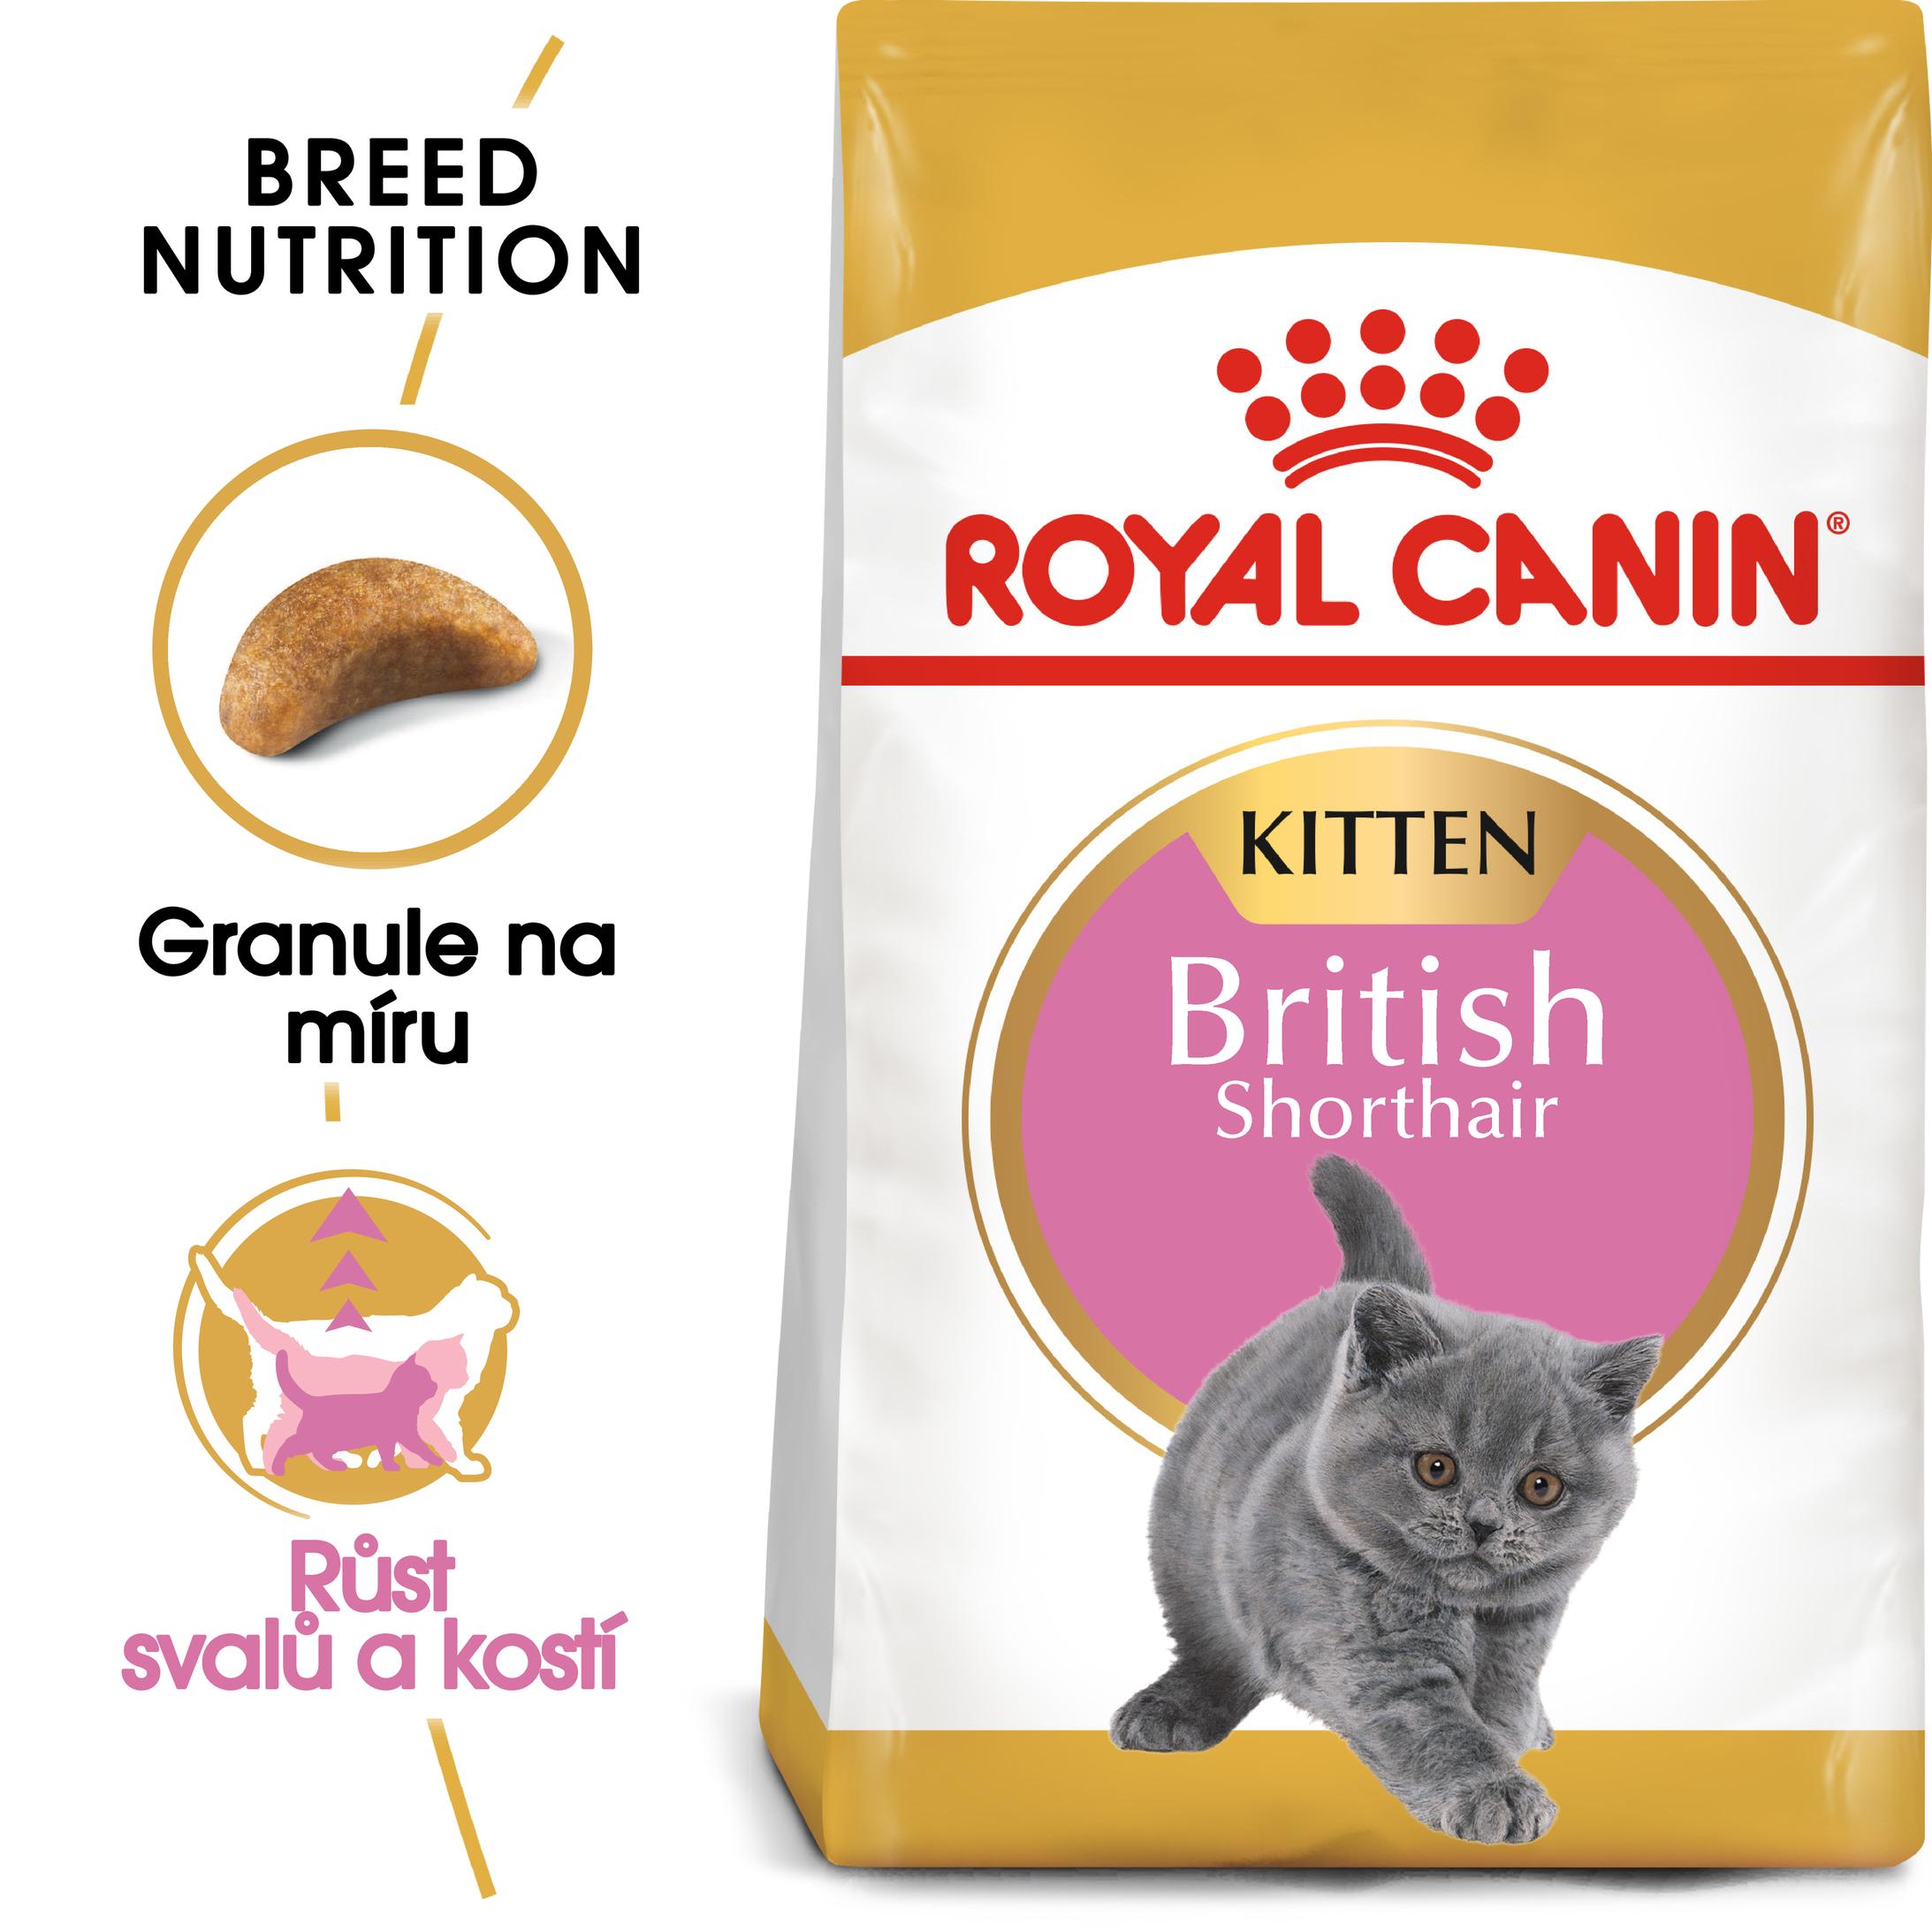 RC cat KITTEN BRITISH shorthair - granule pro britská krátkosrstá koťata - 2kg